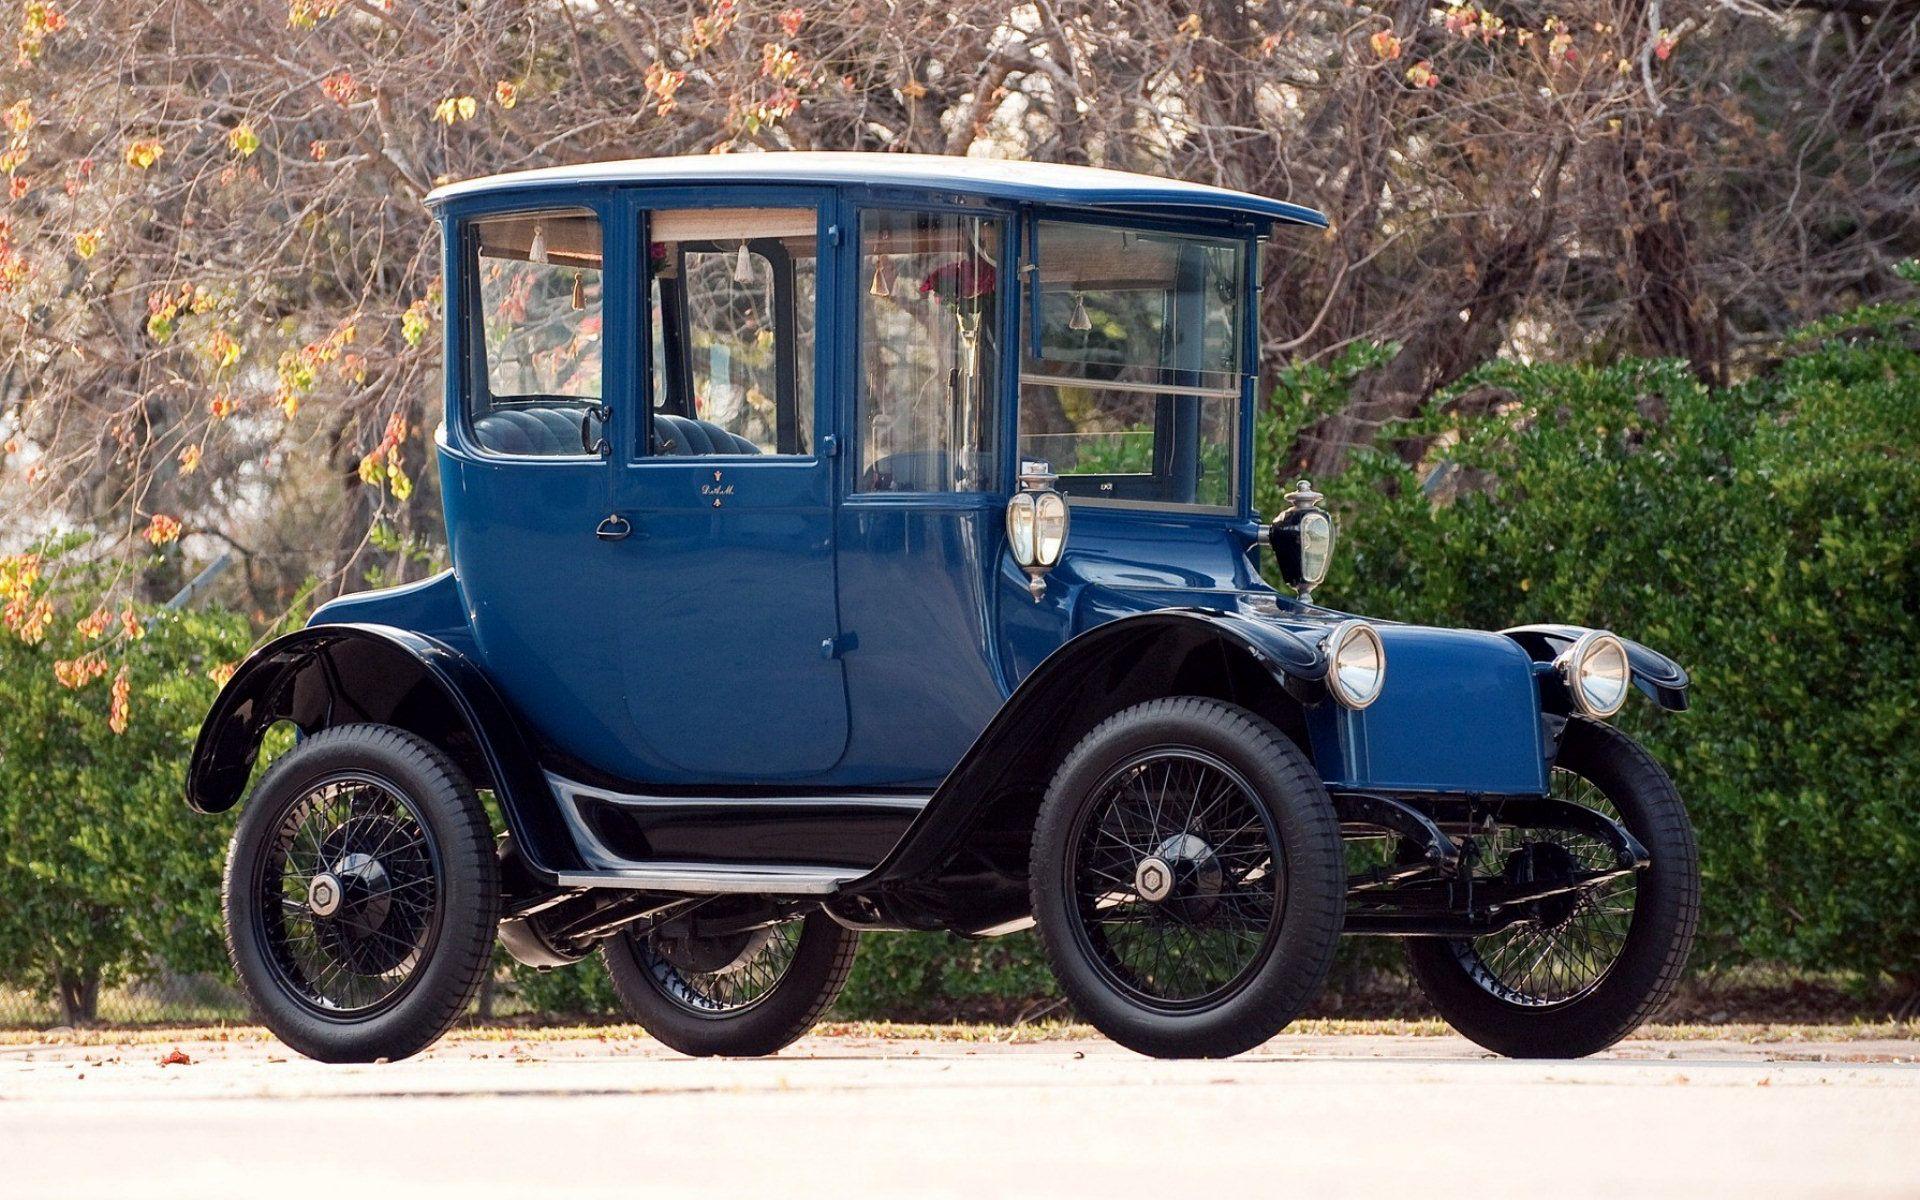 Hd Vintage Classic Old Car Wallpaper Download Free 133394 Luke